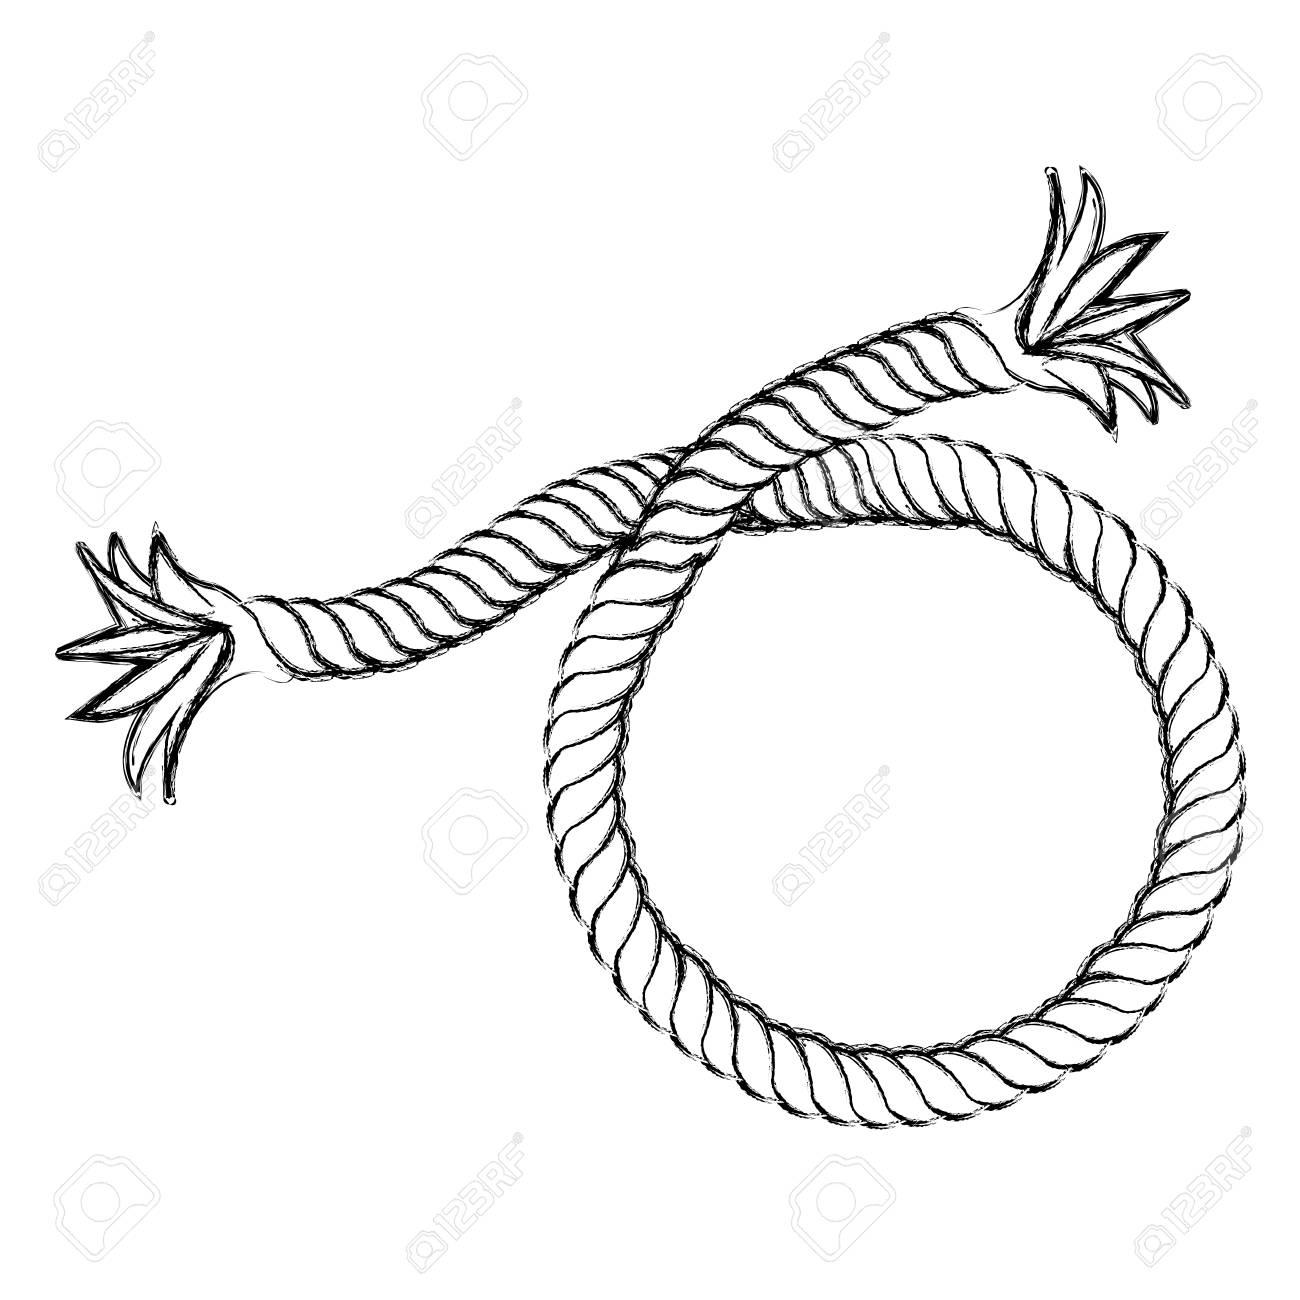 how to tie a trinity knot diagram